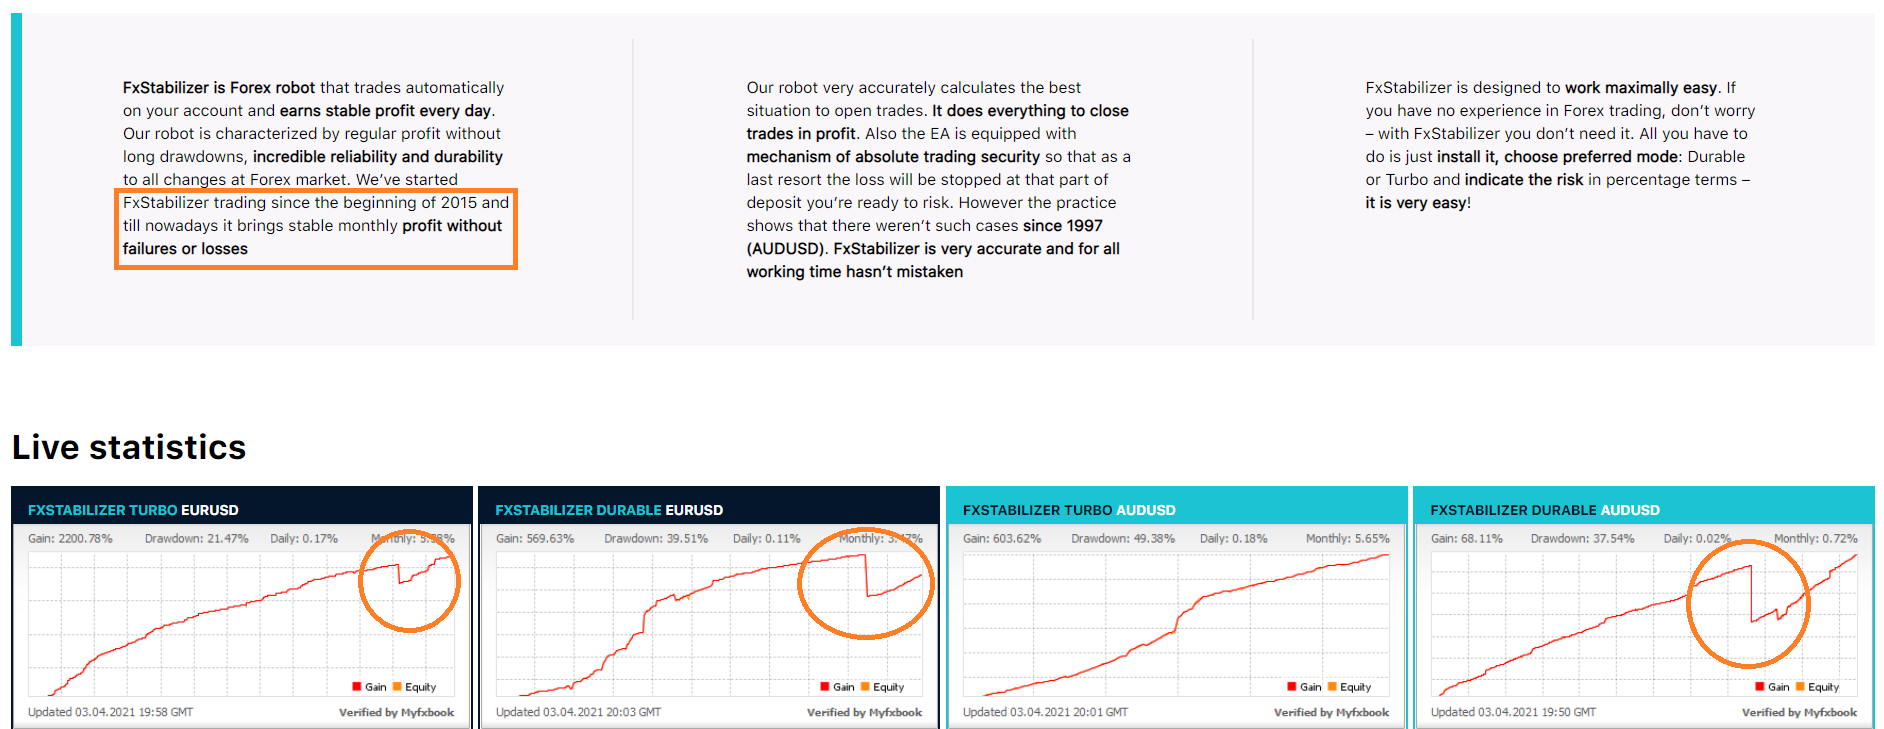 FX Stabilizer live statistics